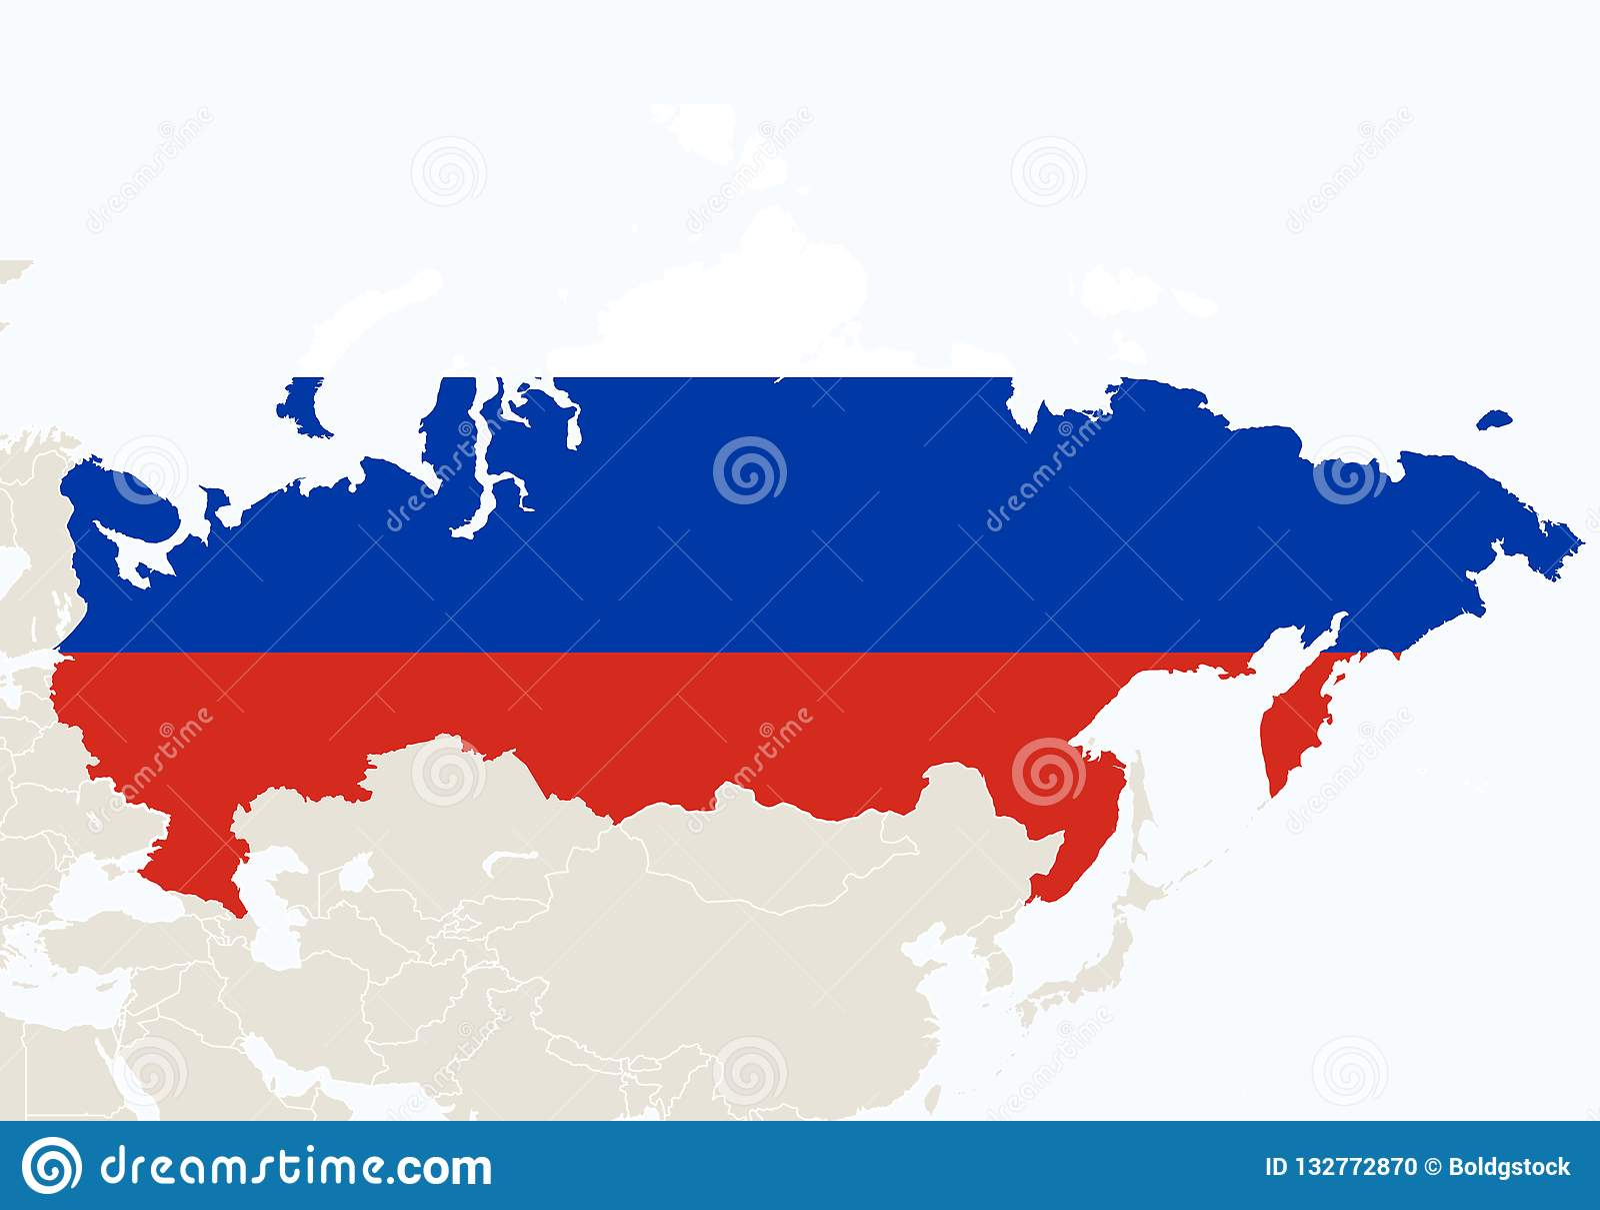 Karte Russland Asien.Asien Mit Hervorgehobener Russland Karte Vektor Abbildung